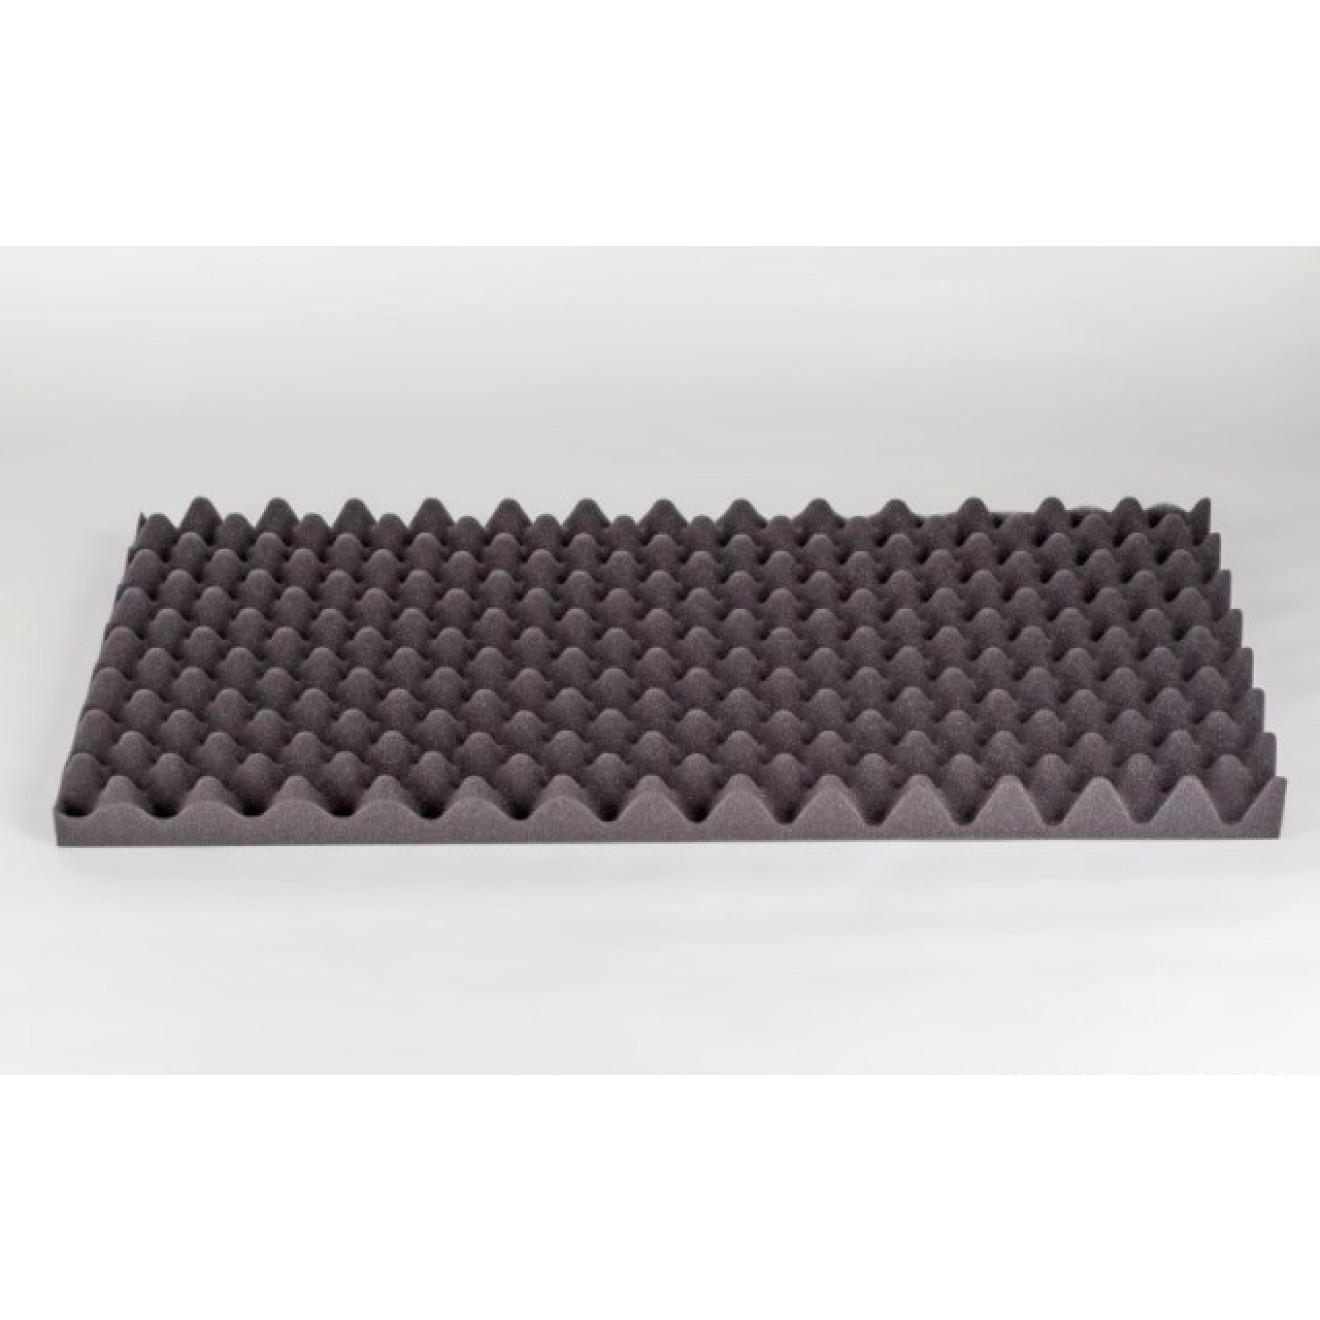 noppenschaumstoff hier ab lager kaufen. Black Bedroom Furniture Sets. Home Design Ideas